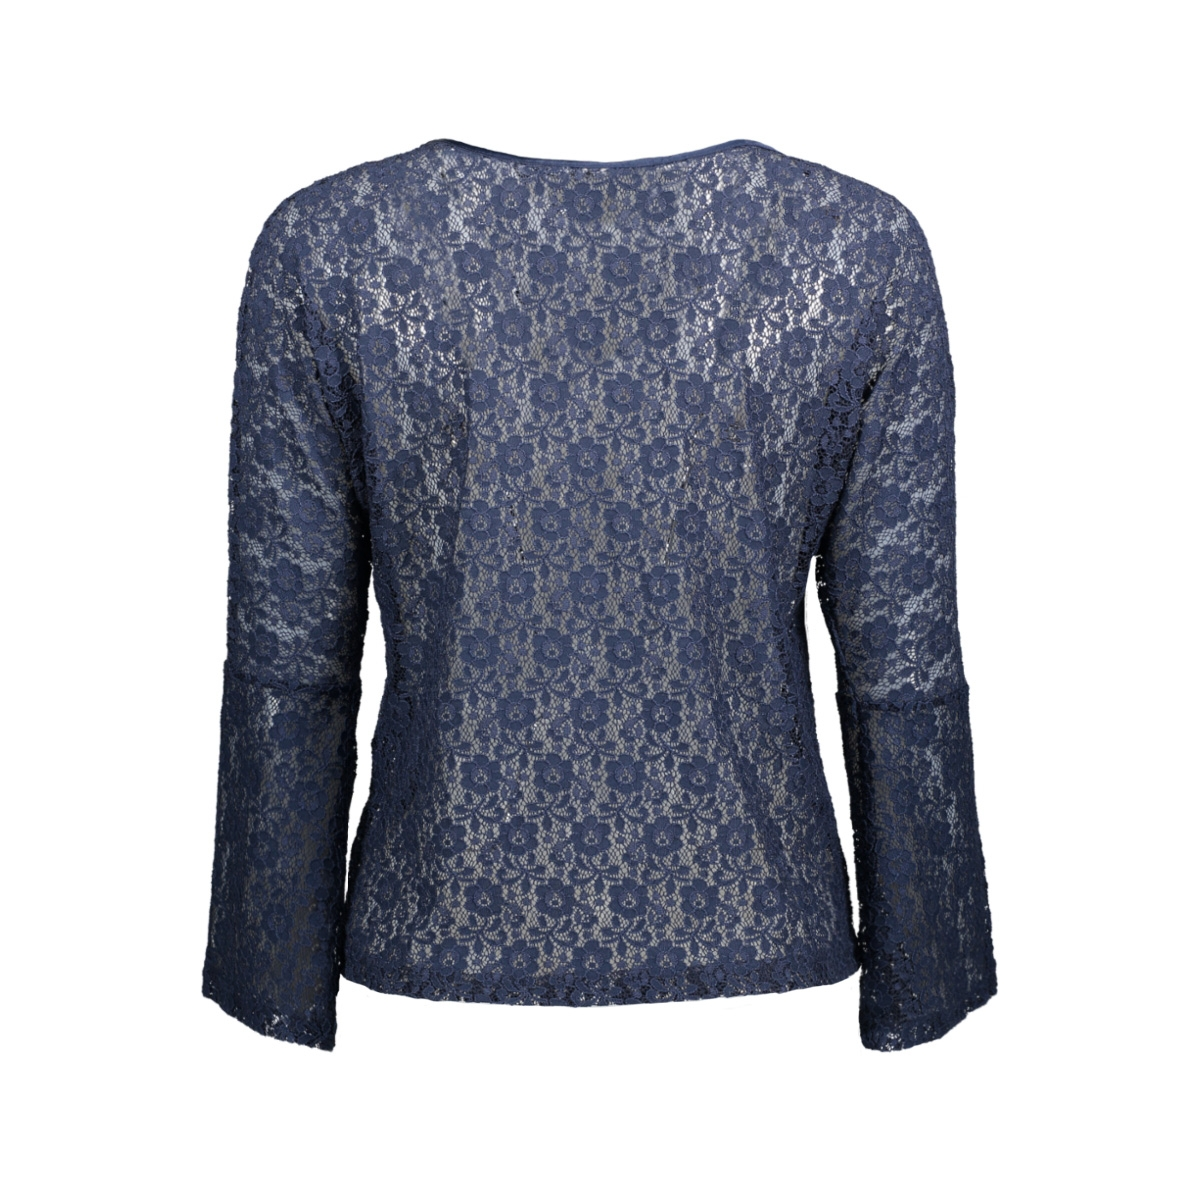 jdyeverly l/s top jrs 15138529 jacqueline de yong t-shirt black iris